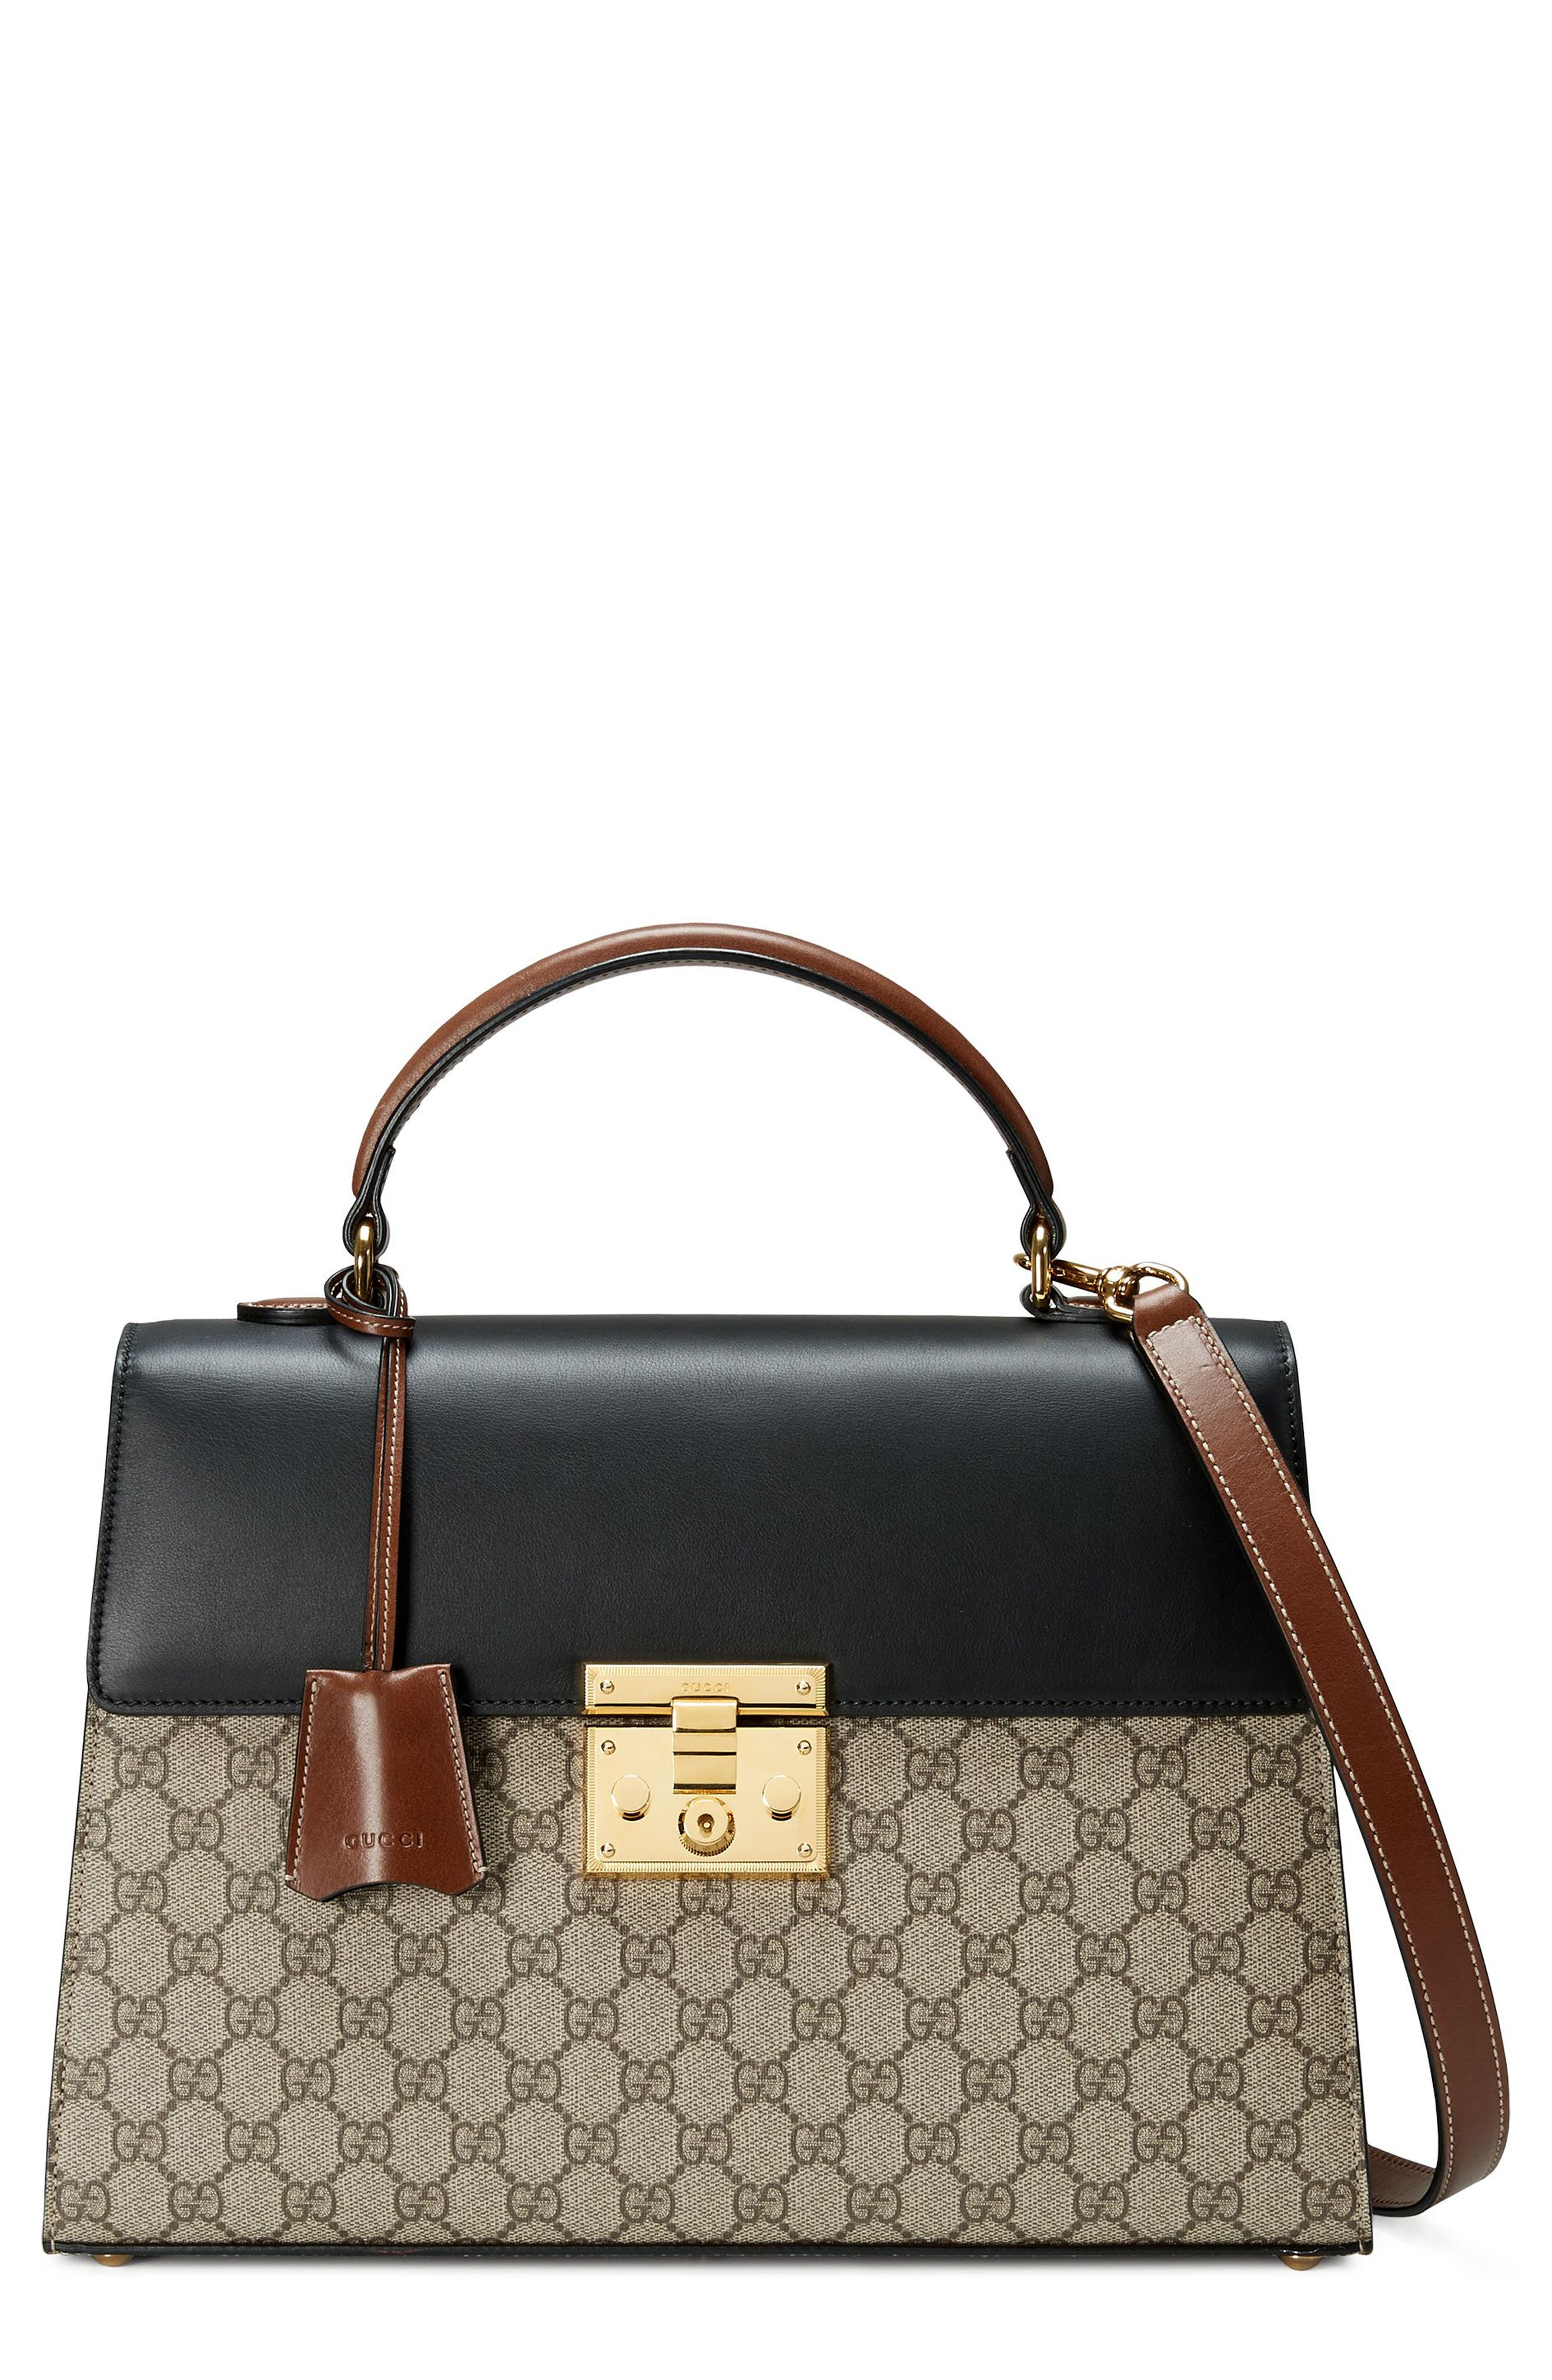 GUCCI Medium Padlock Top Handle GG Supreme Canvas & Leather Bag